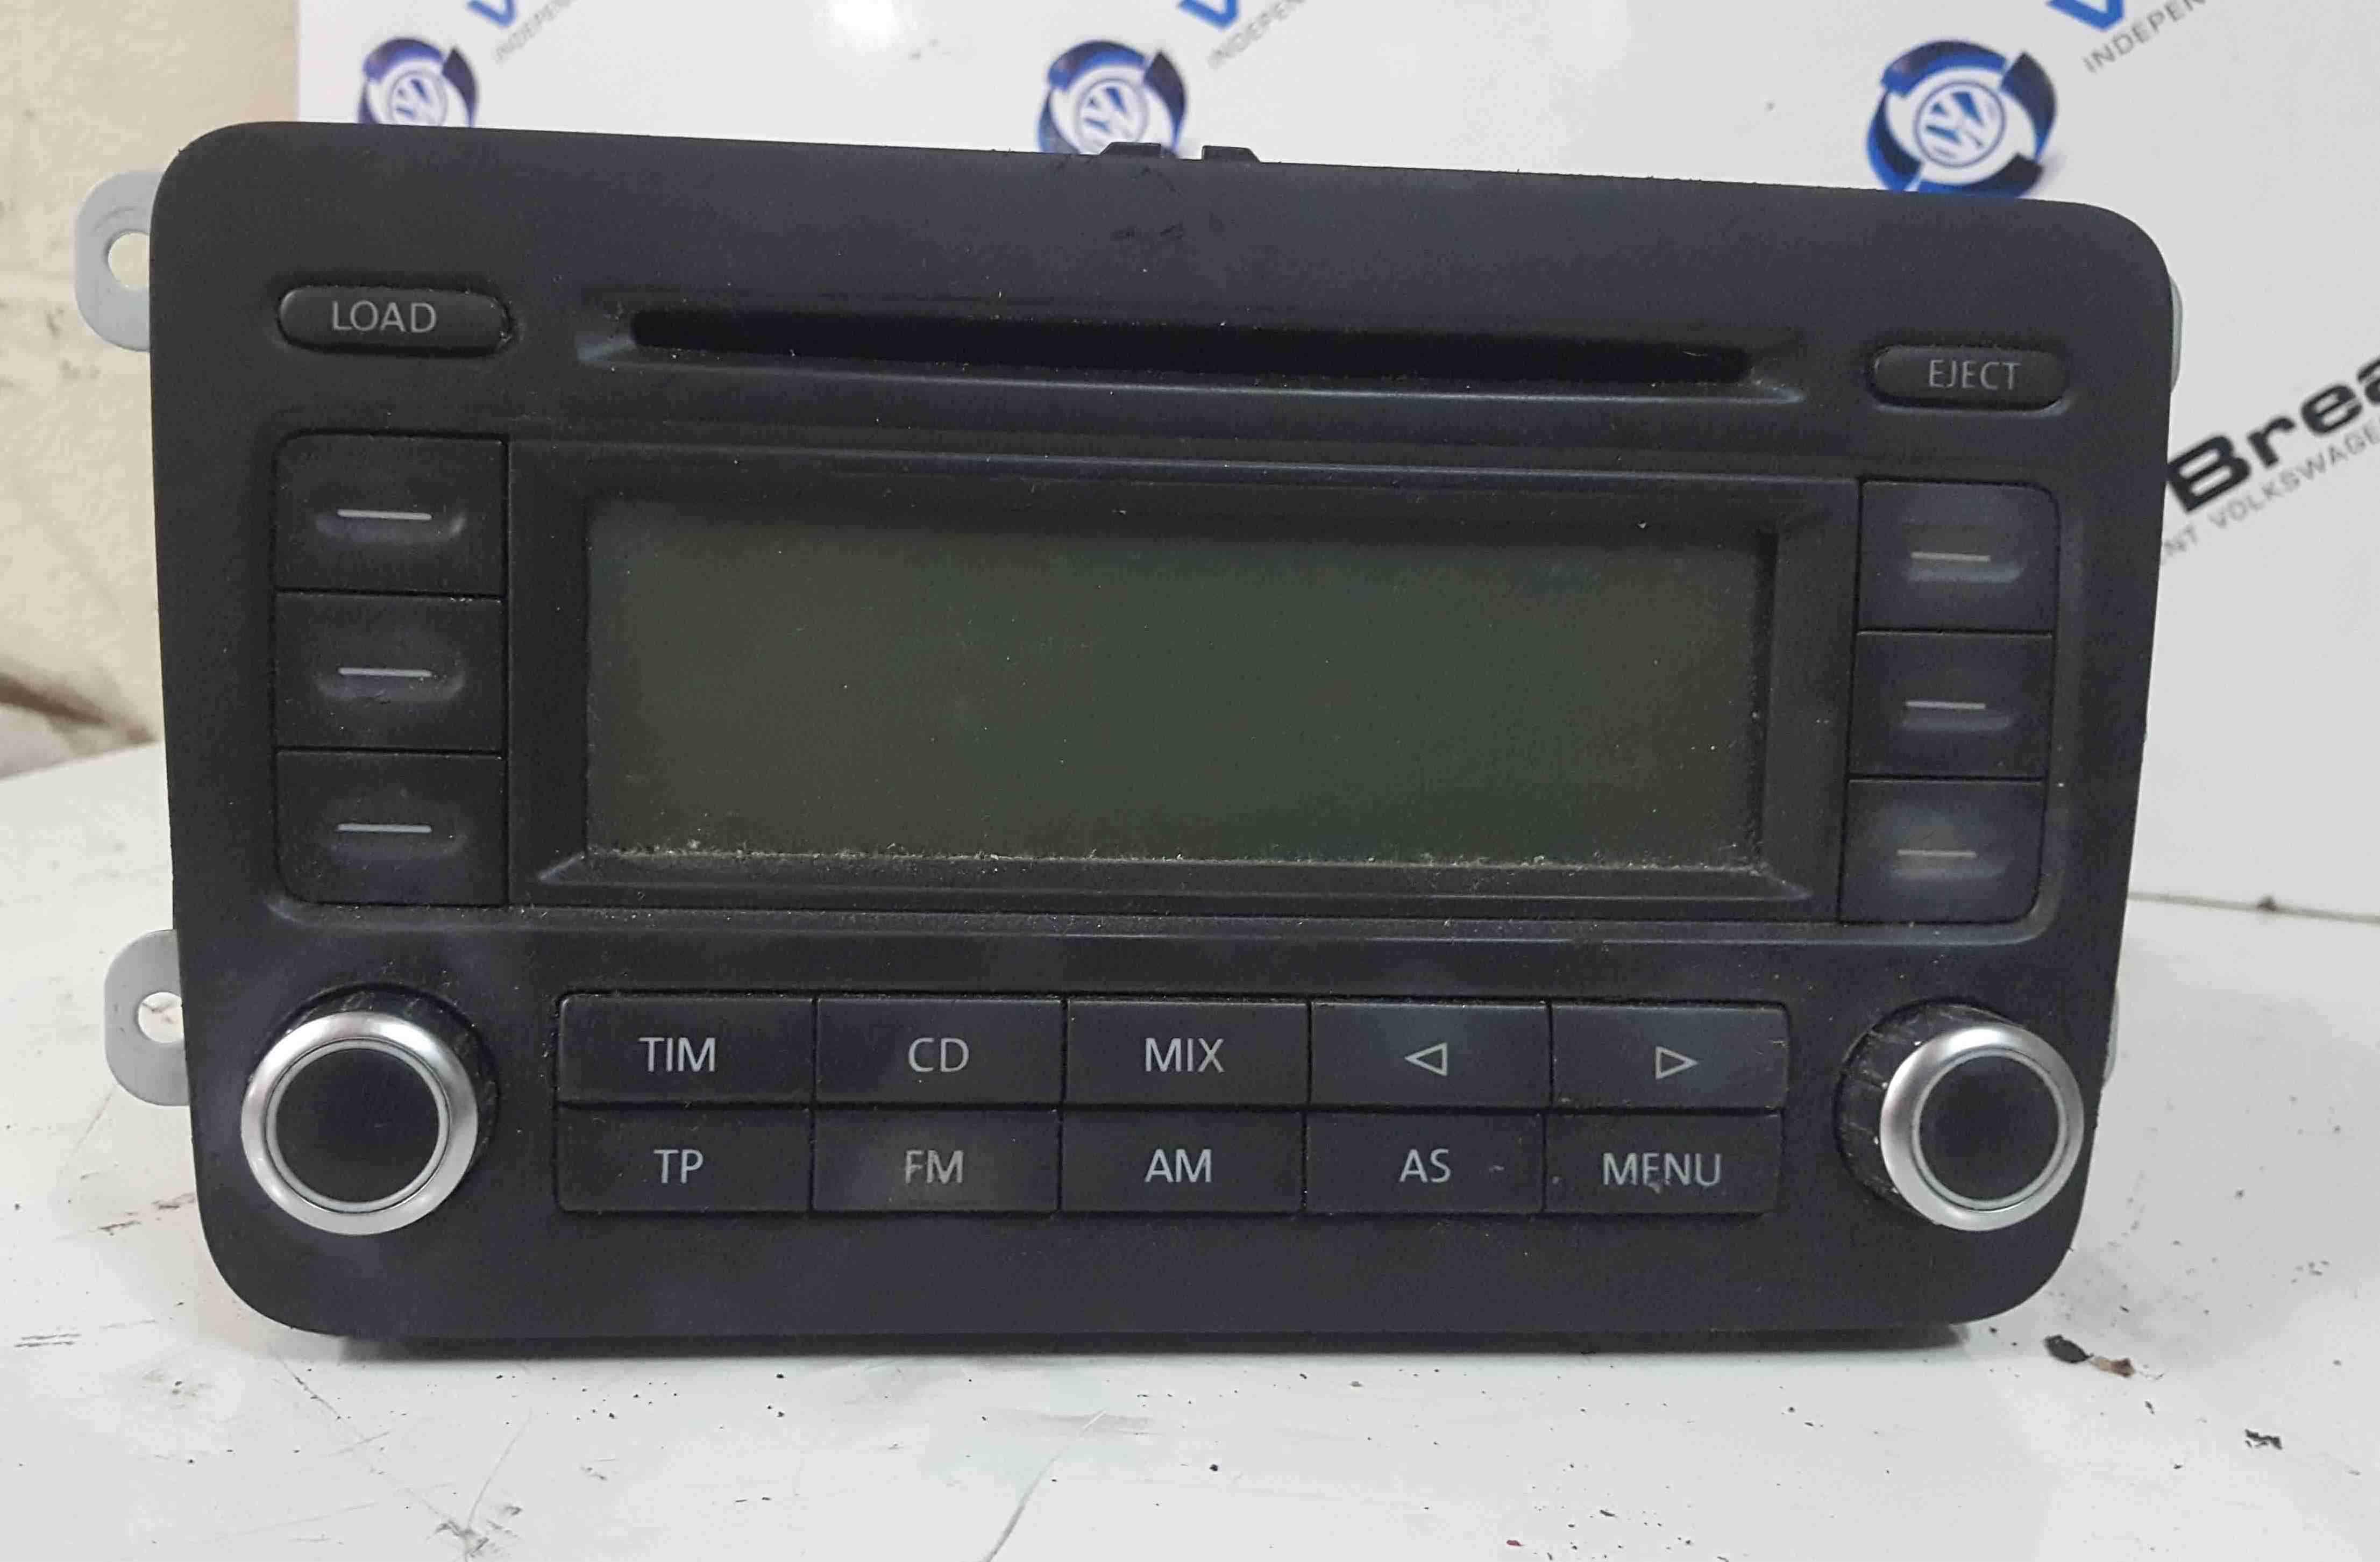 Volkswagen Touran 2003-2006 Radio Cd Player Unit 1K0035195B